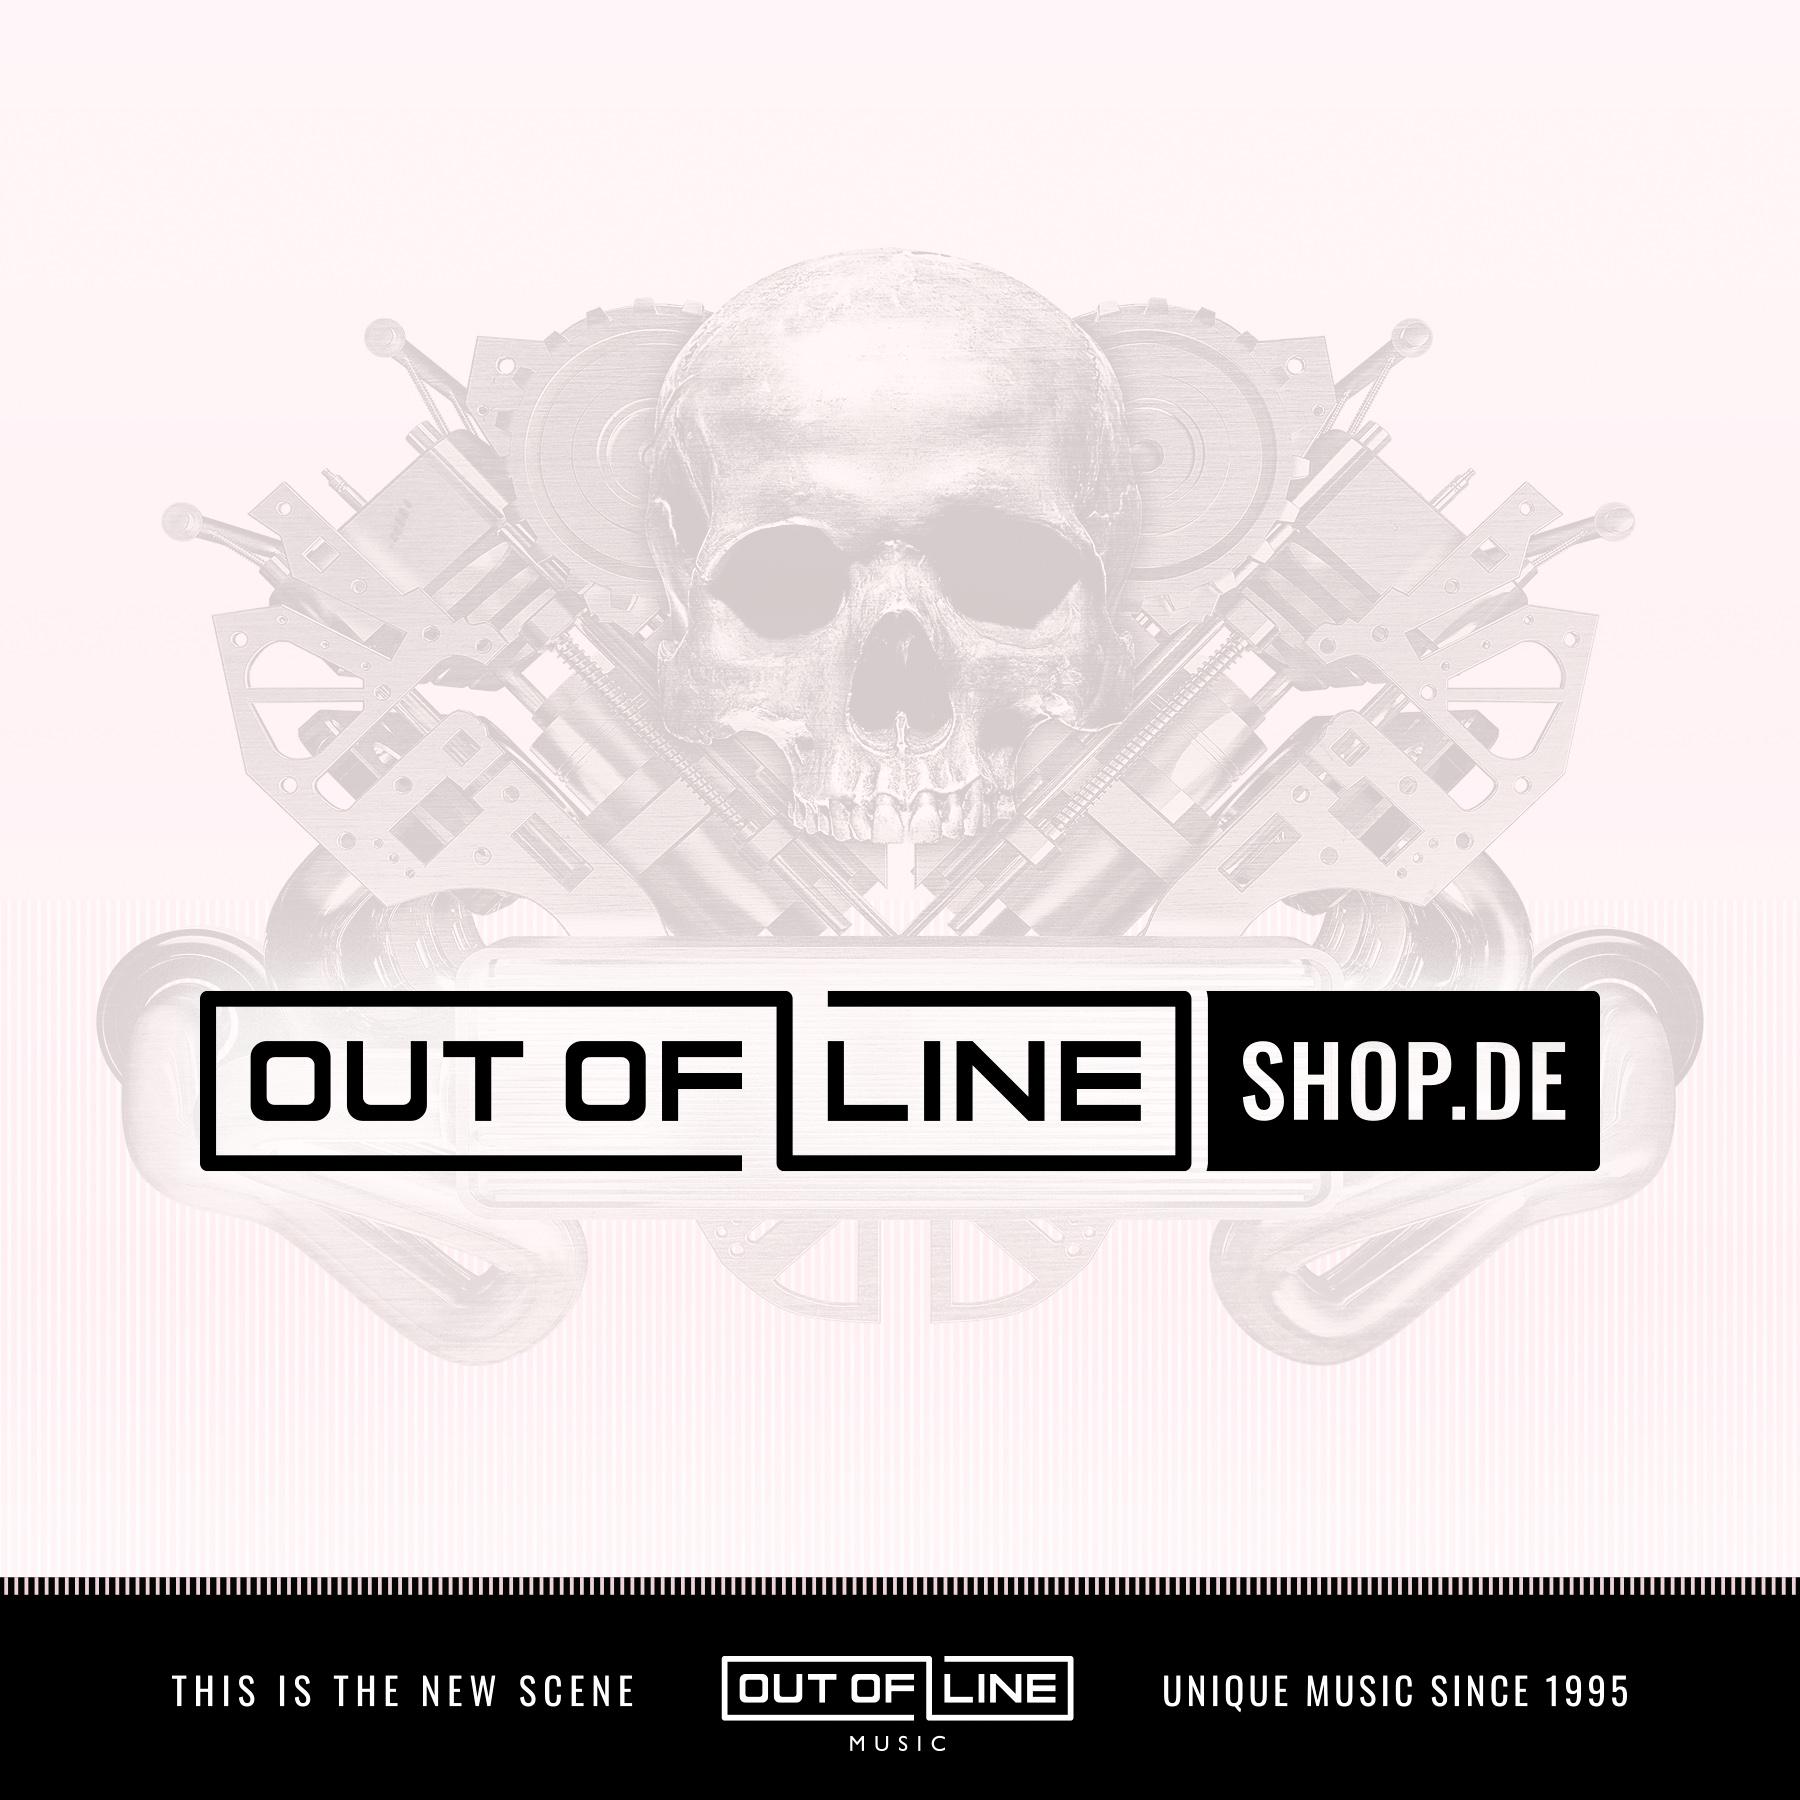 Heaven Shall Burn - Wanderer (Limited Edition) - 3CD